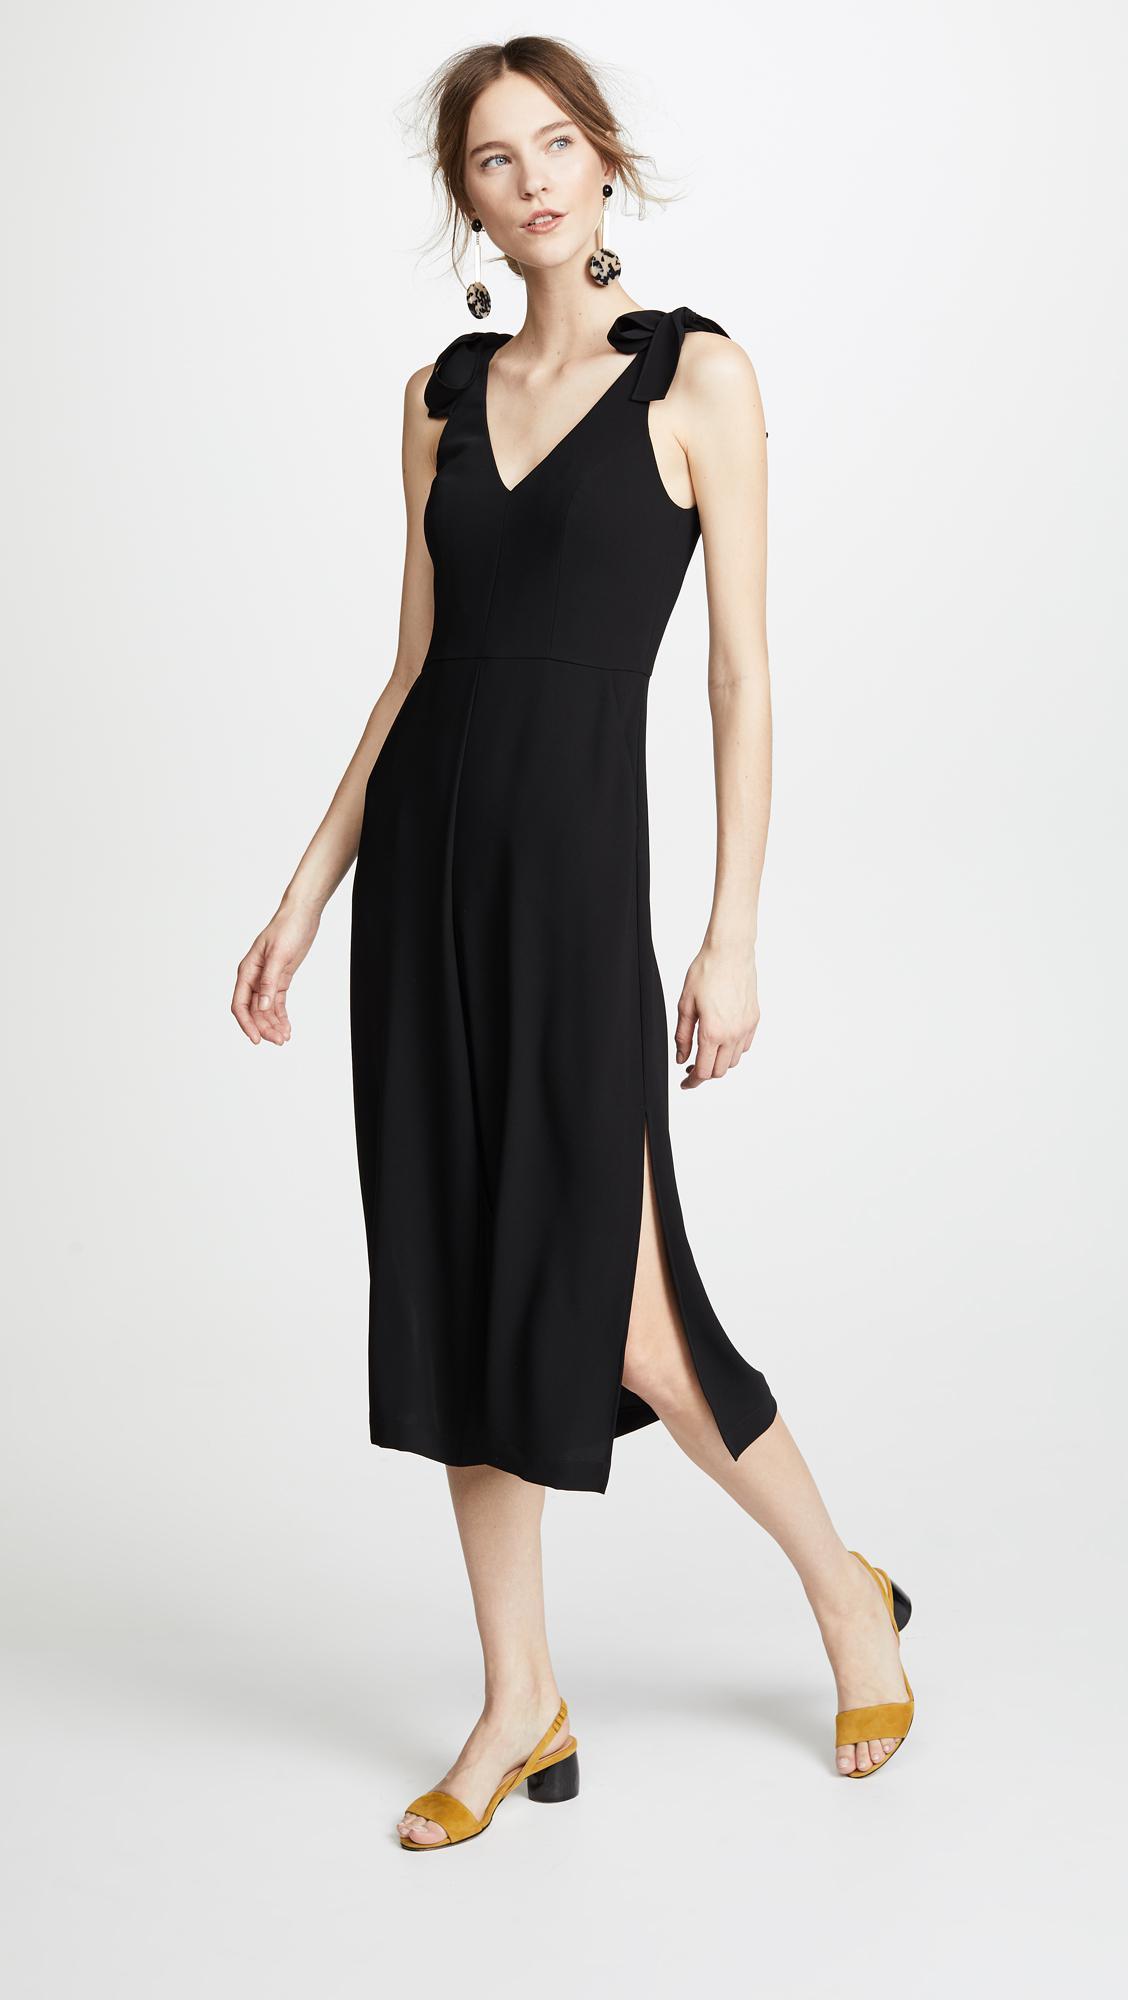 4b688af15f71 Lyst - Amanda Uprichard Iris Jumpsuit in Black